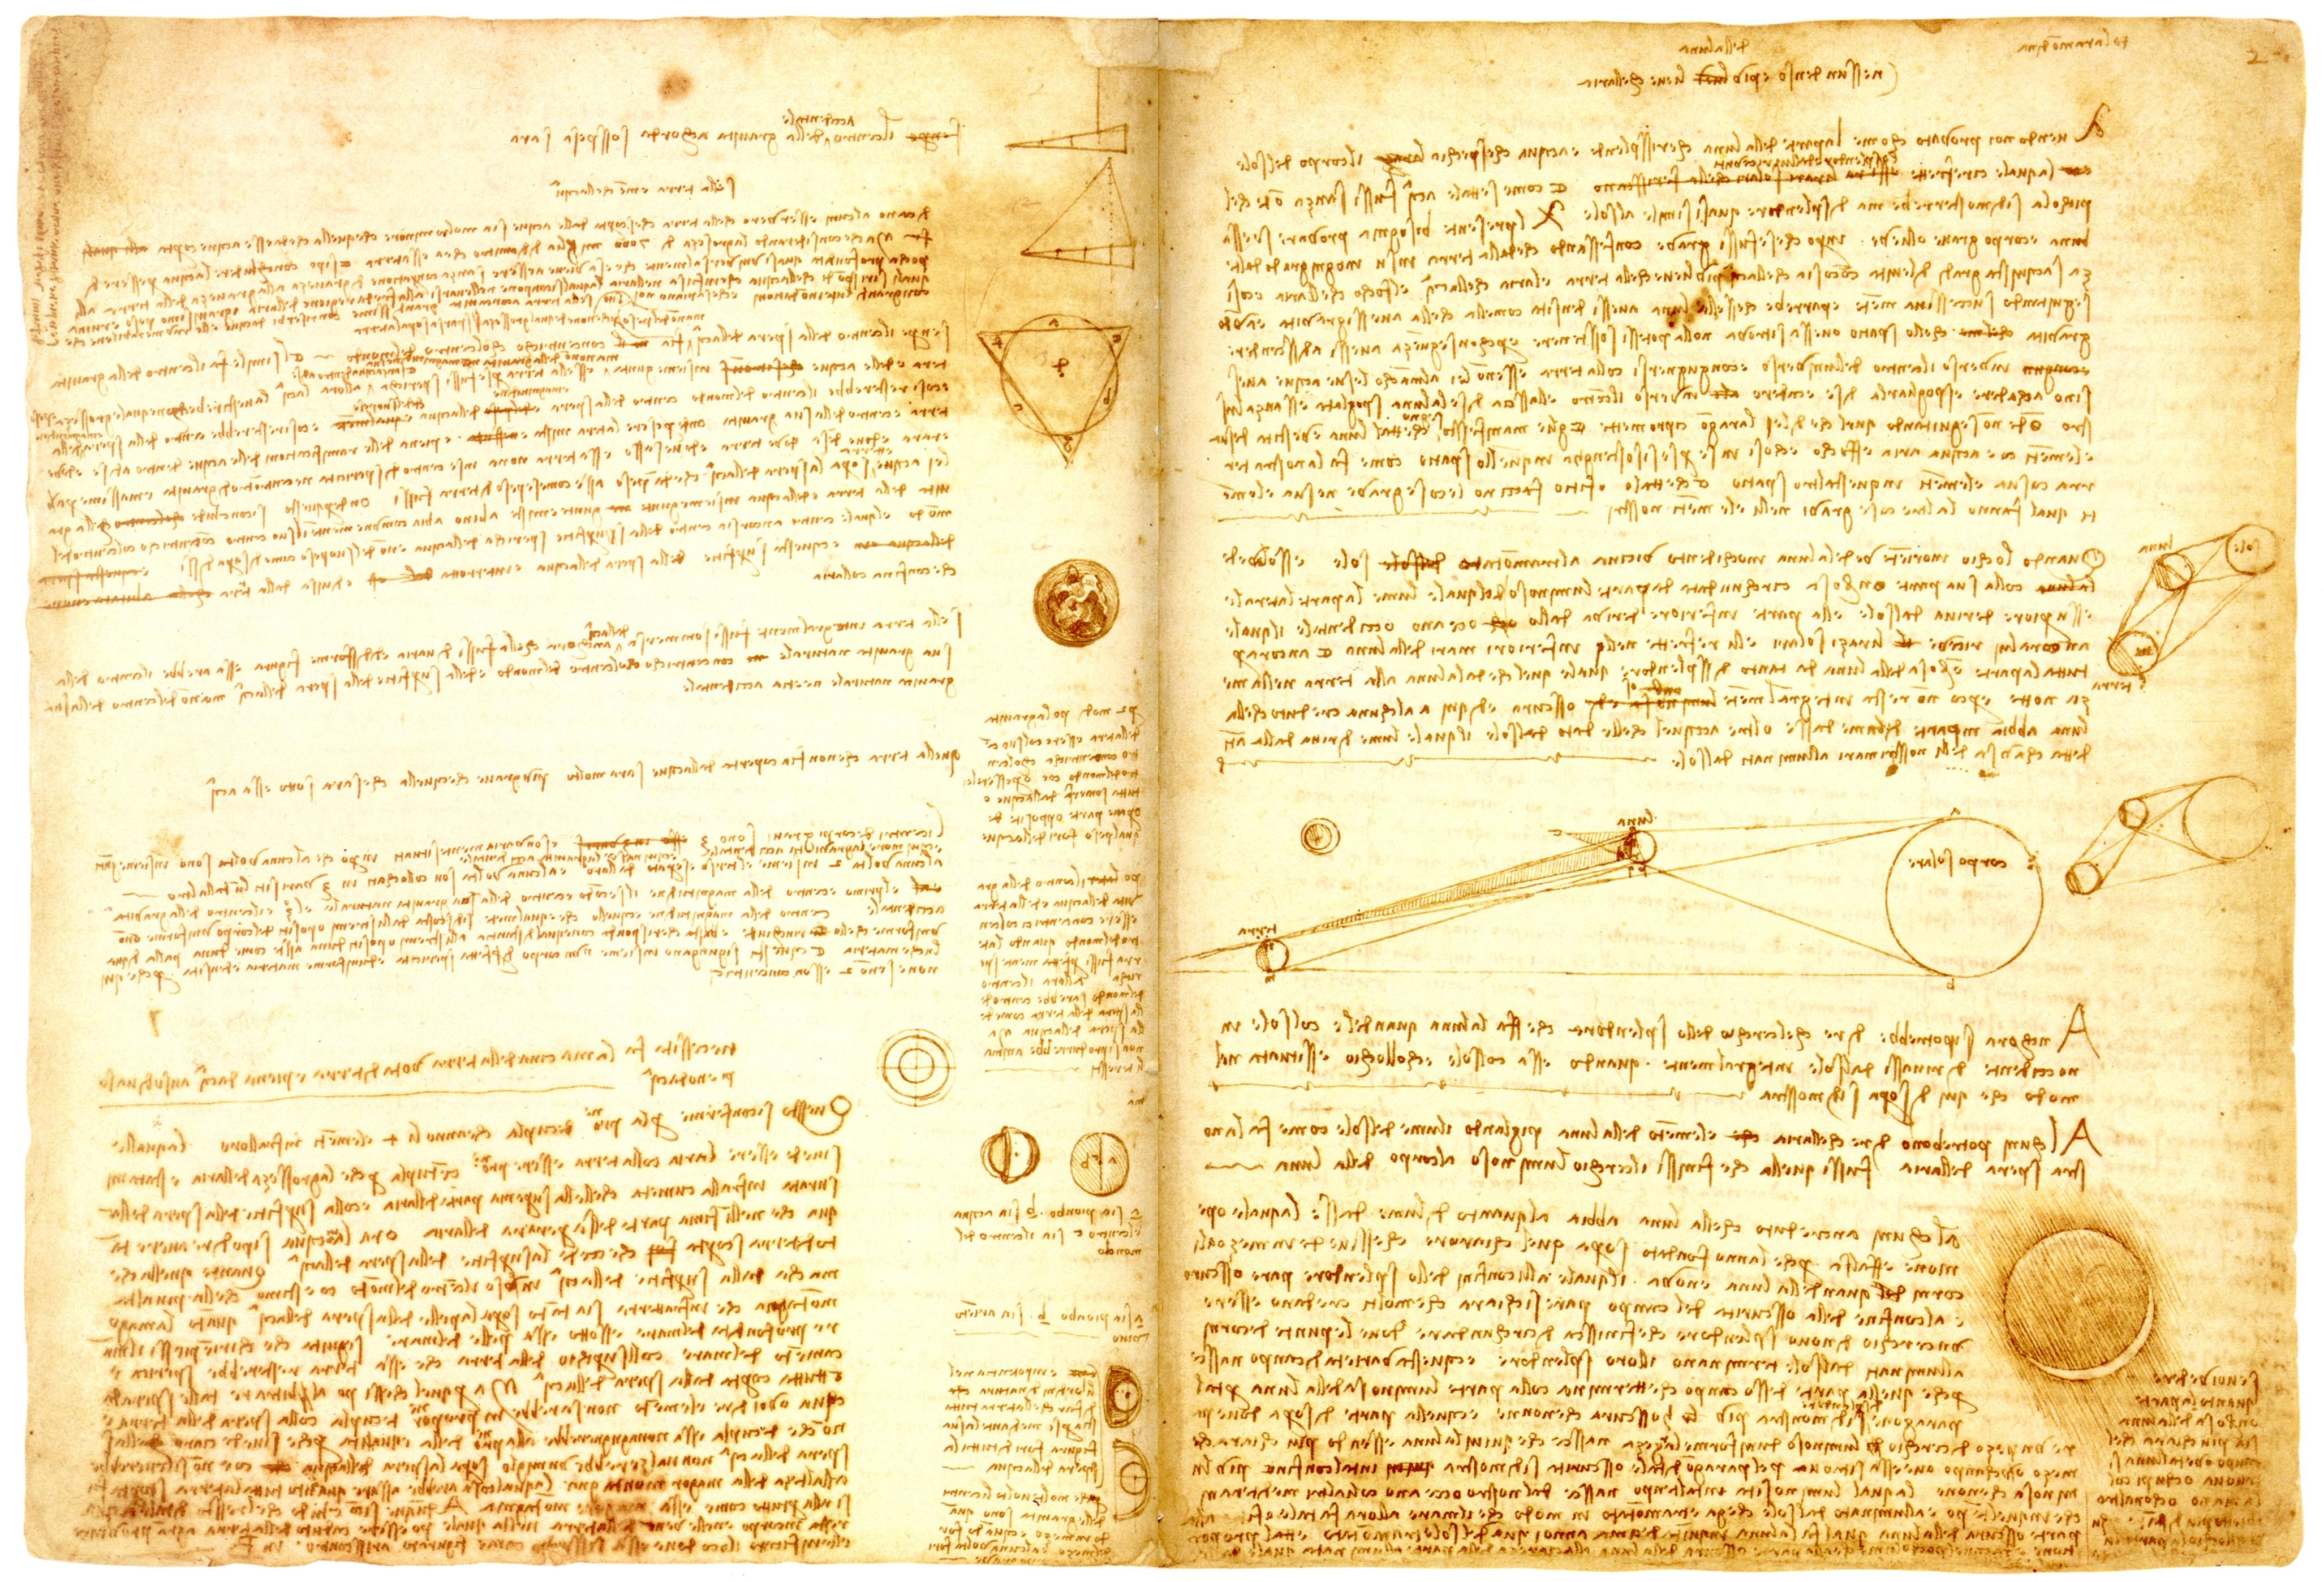 Codex Leicester by Leonardo Da Vinci